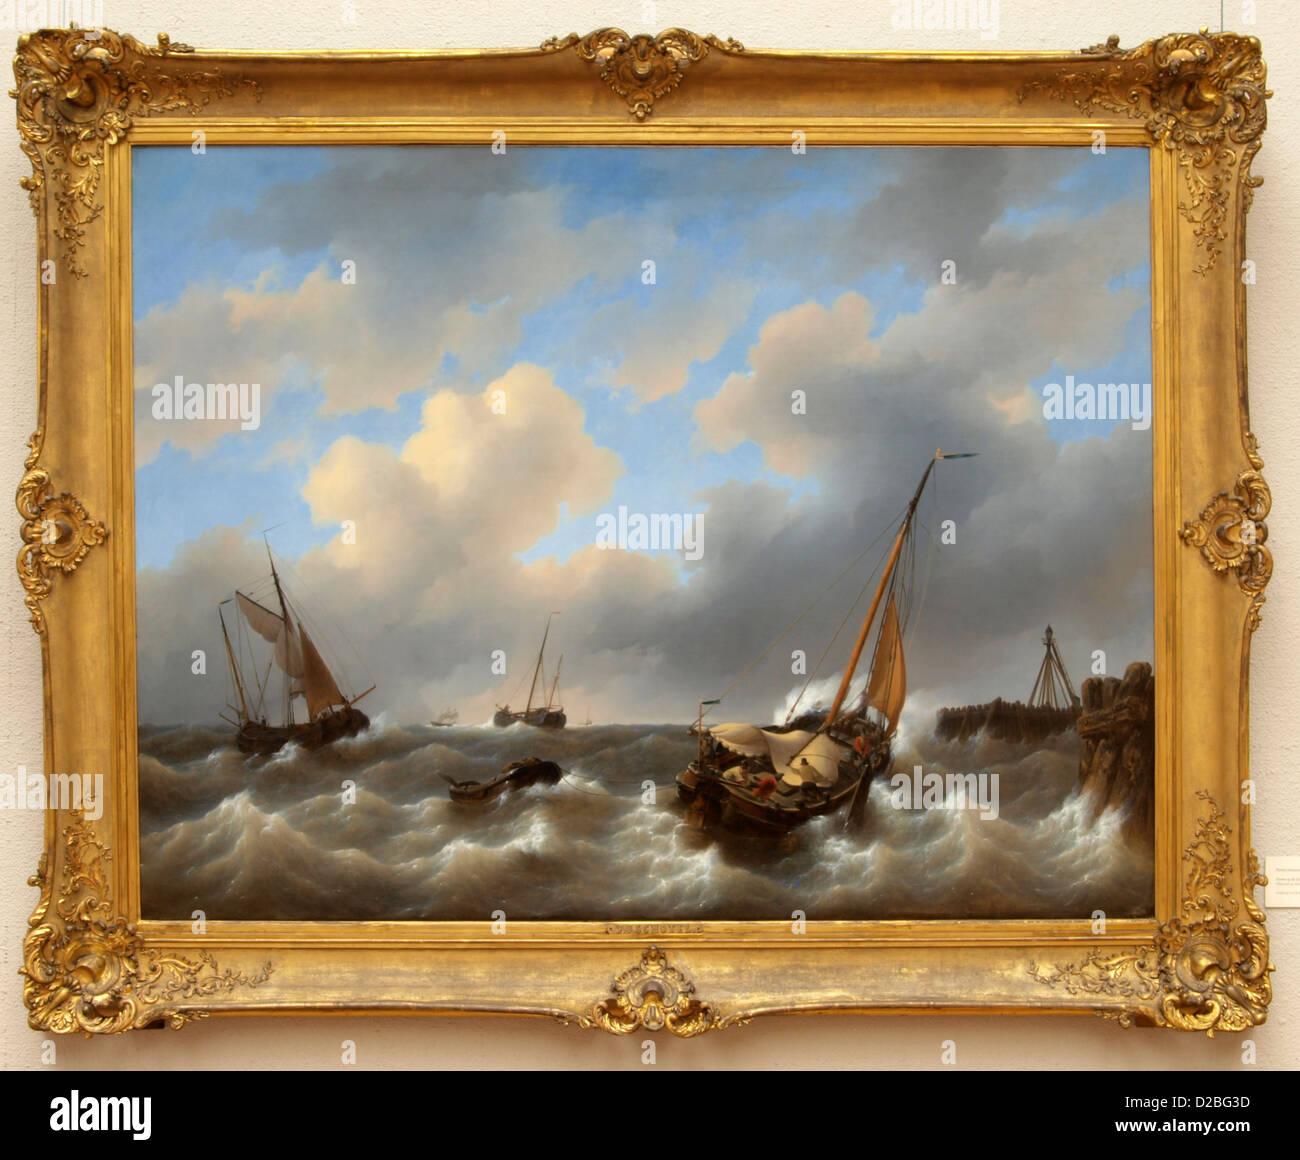 Peter John Platter (1808-1865), Storm on the Zuiderzee Medemblik, 1840, Oil on canvas - Stock Image